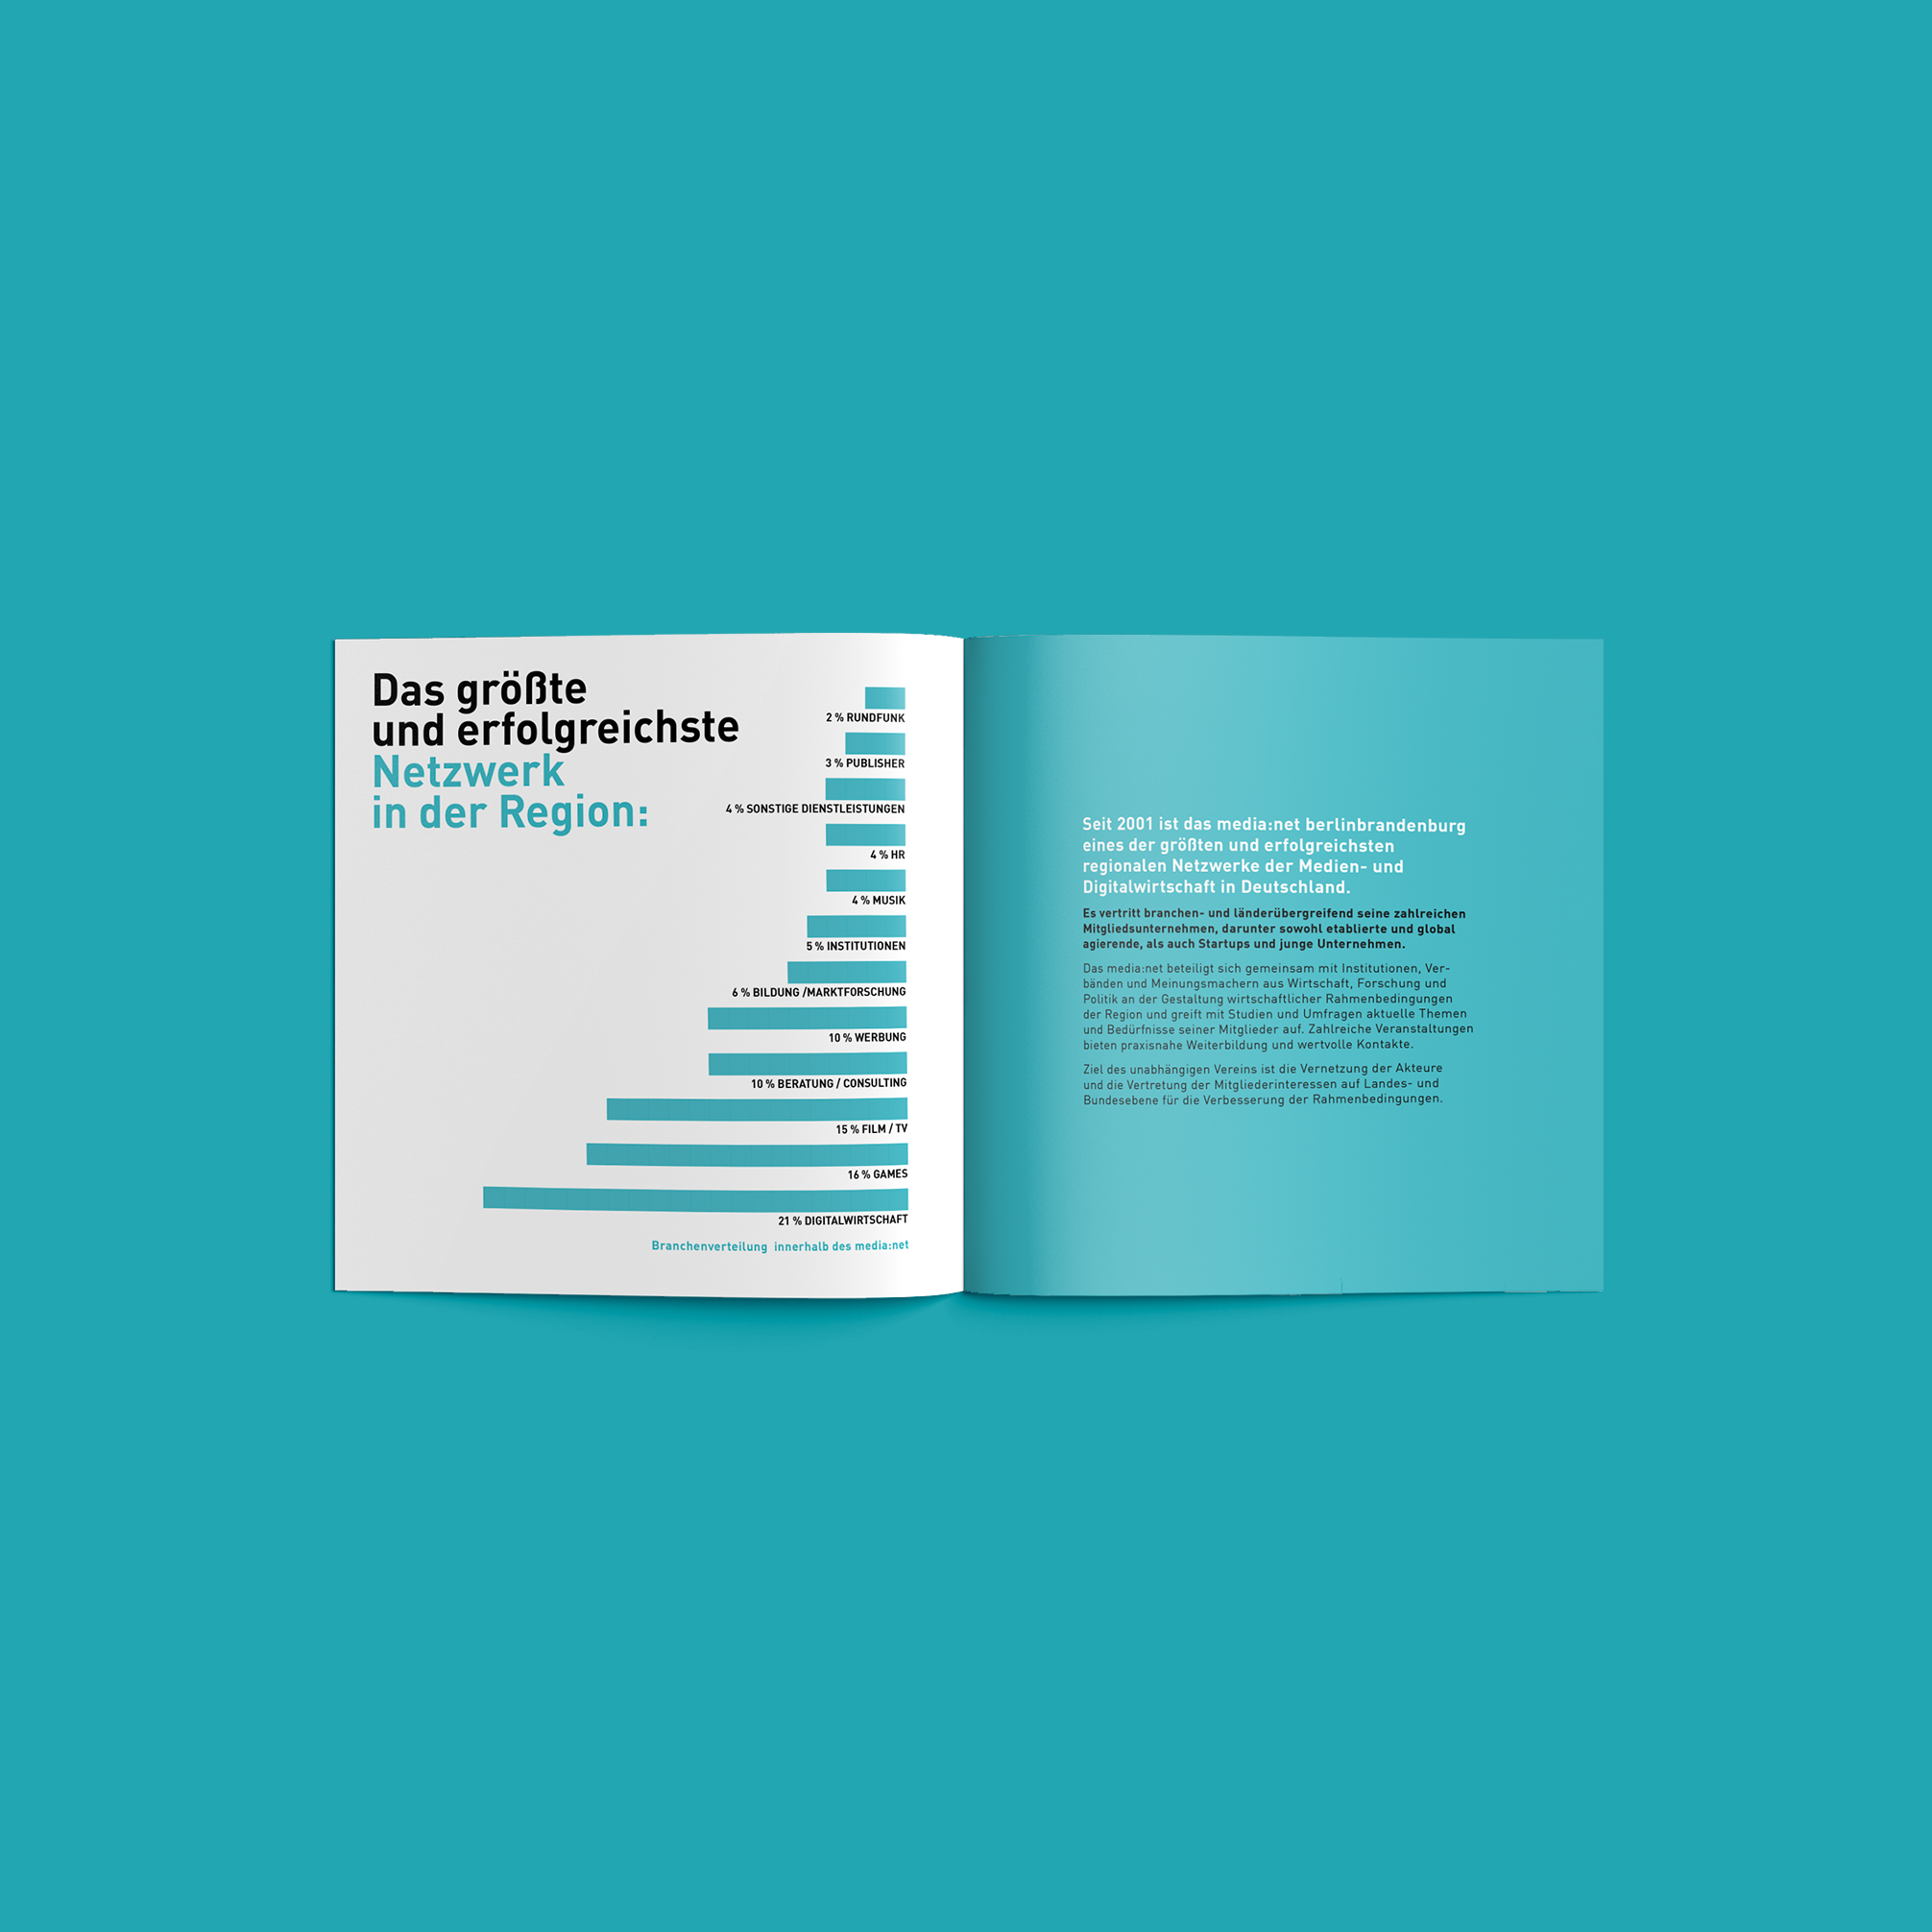 Media net berlinbrandenburg Image Broschüre - Region | Corporate Redesign